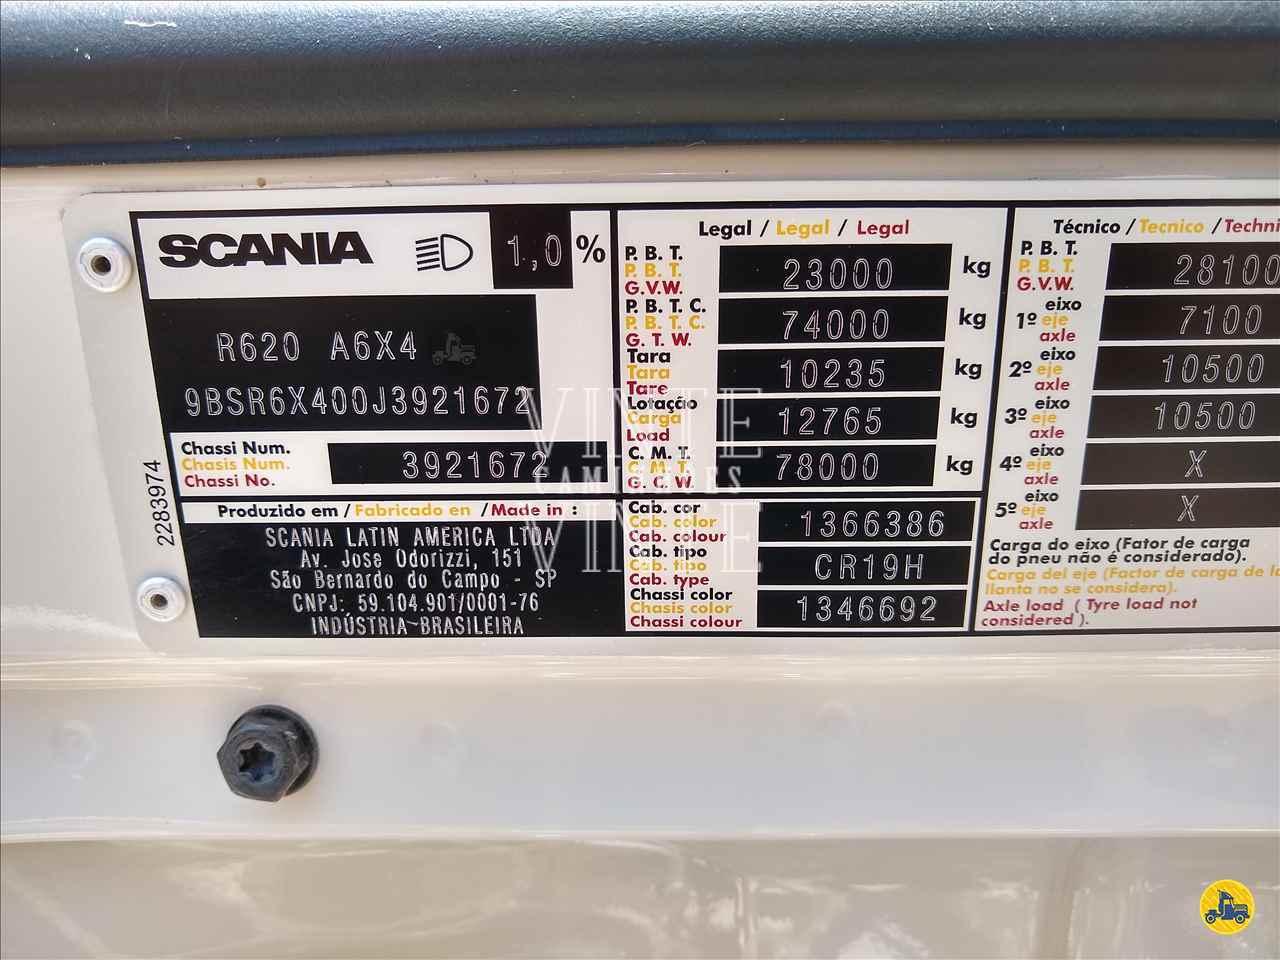 SCANIA SCANIA 620 210000km 2018/2018 Vinte-Vinte Caminhões